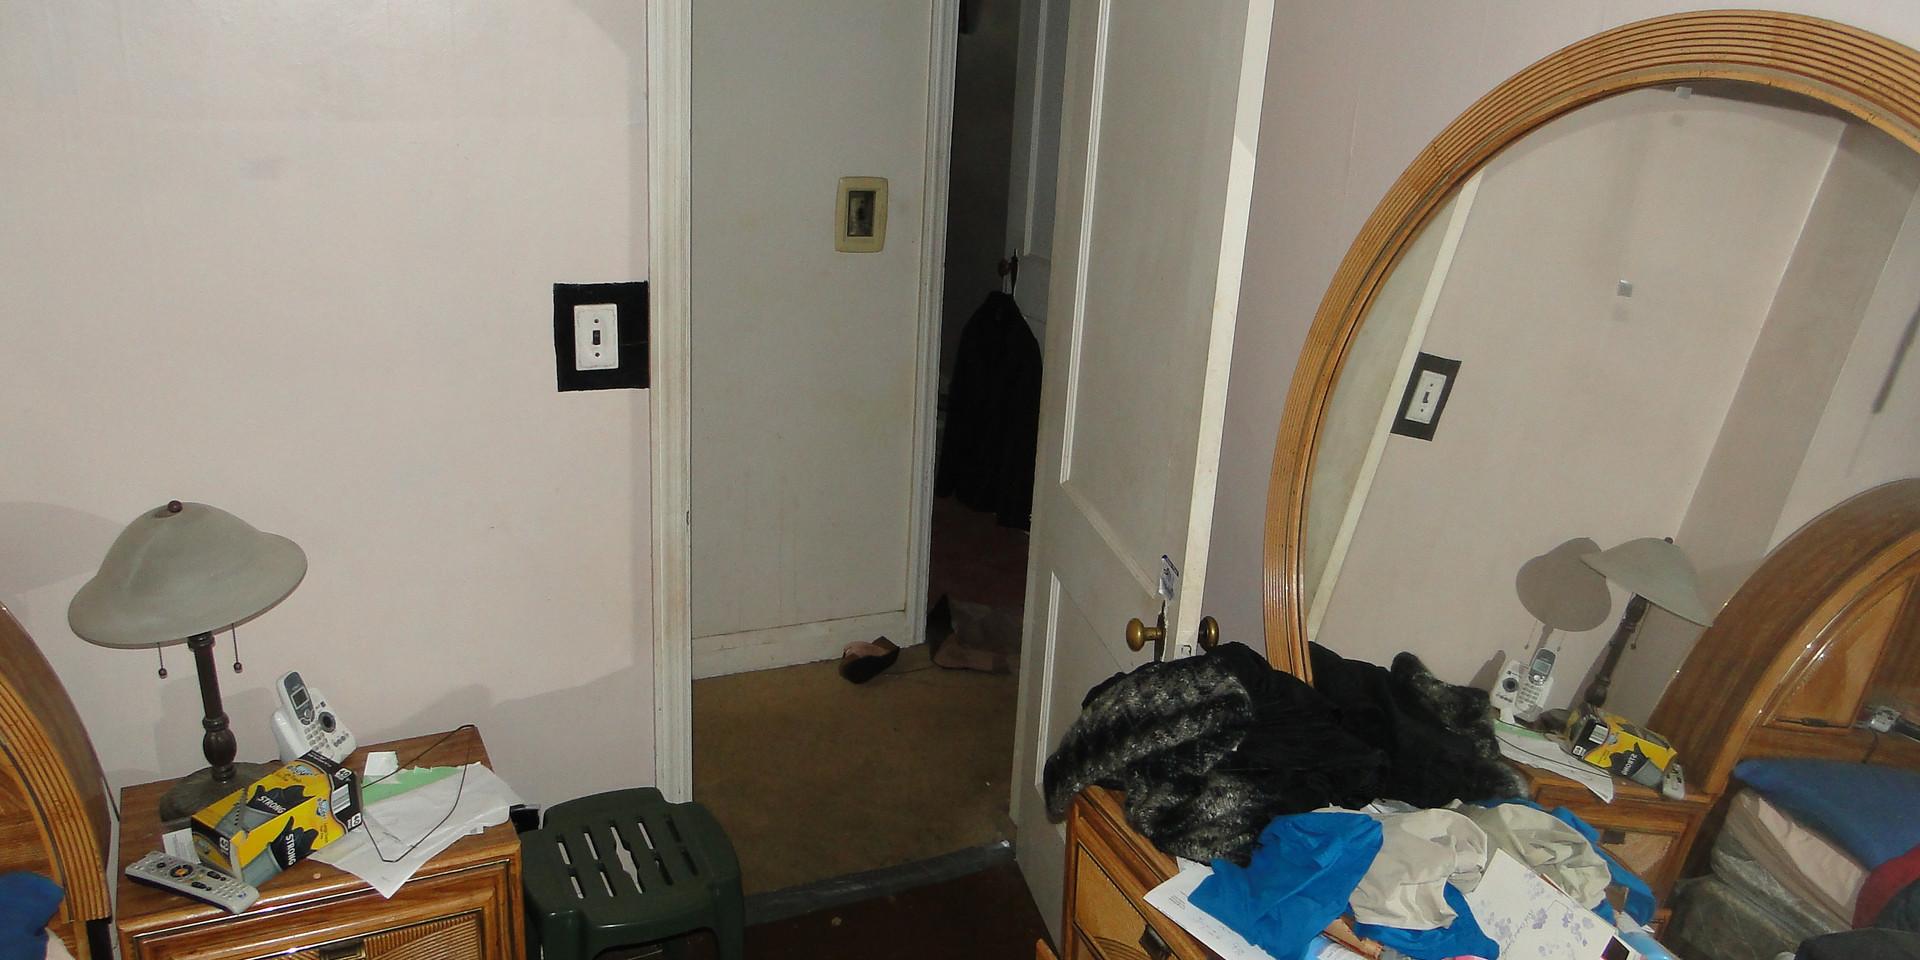 07 - Bedroom 4.JPG